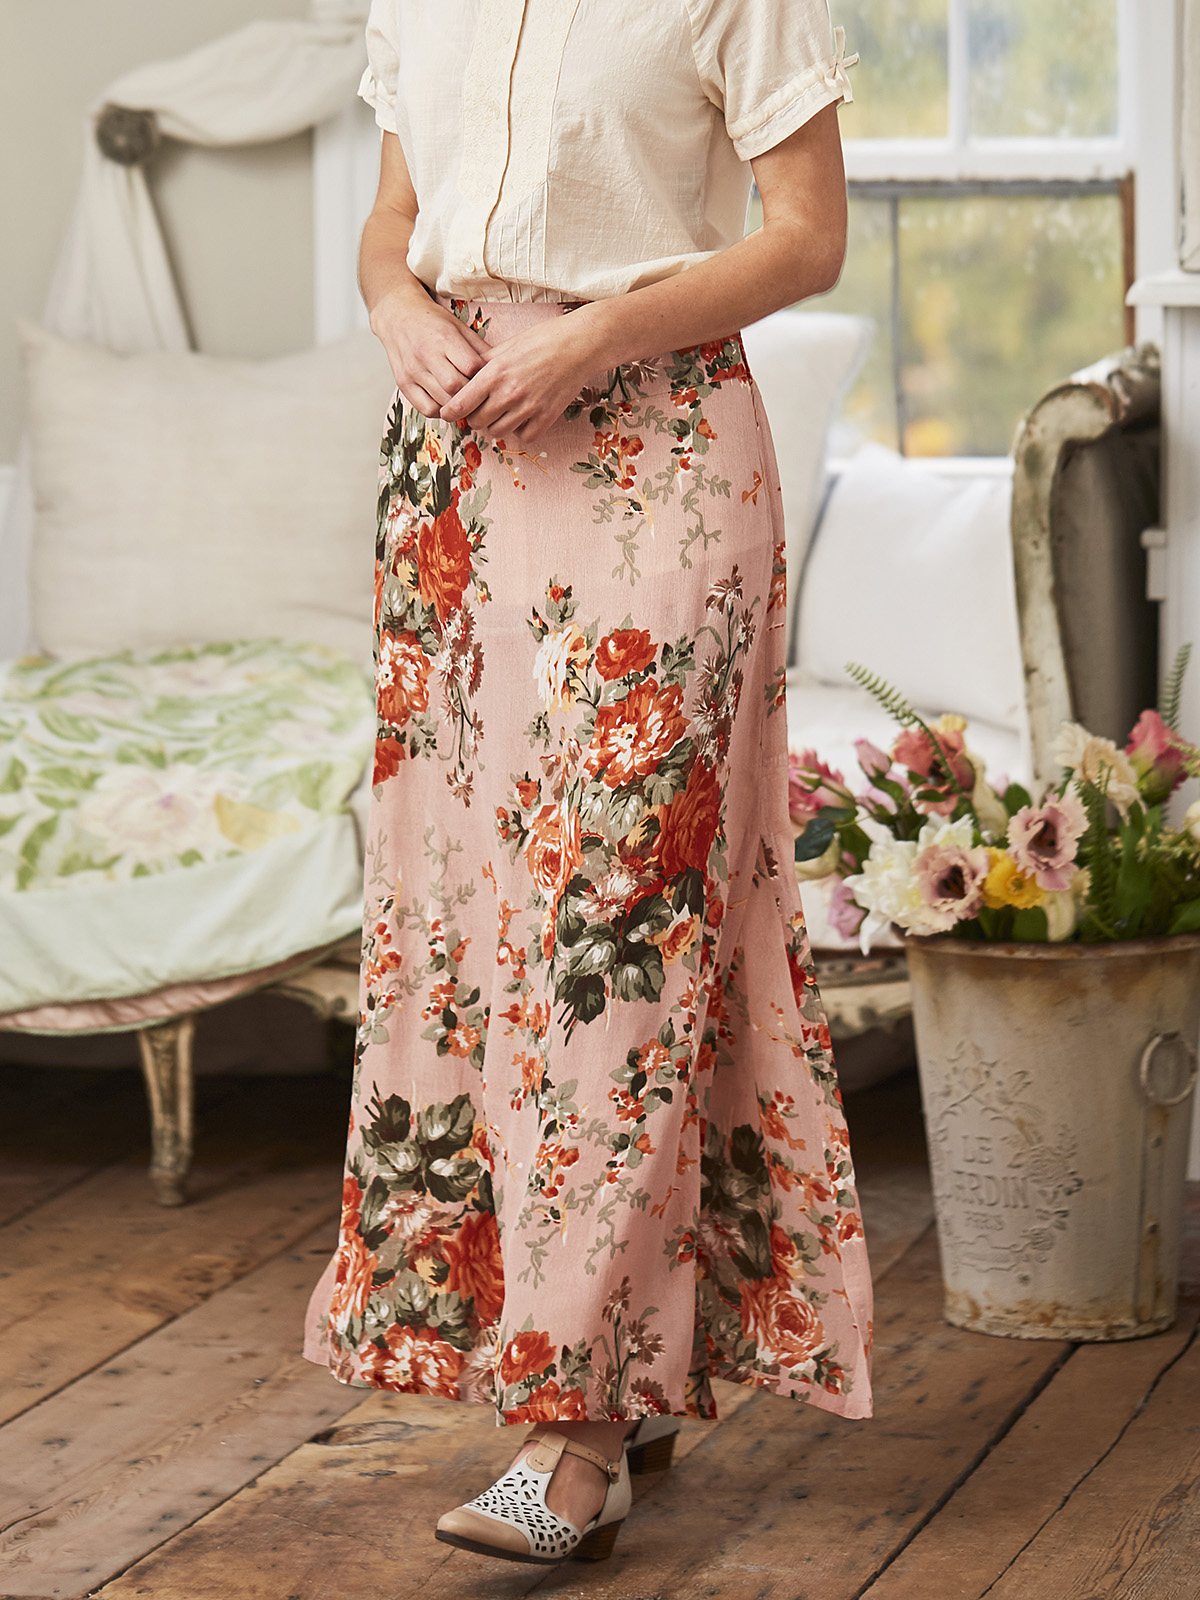 Briar Rose Skirt